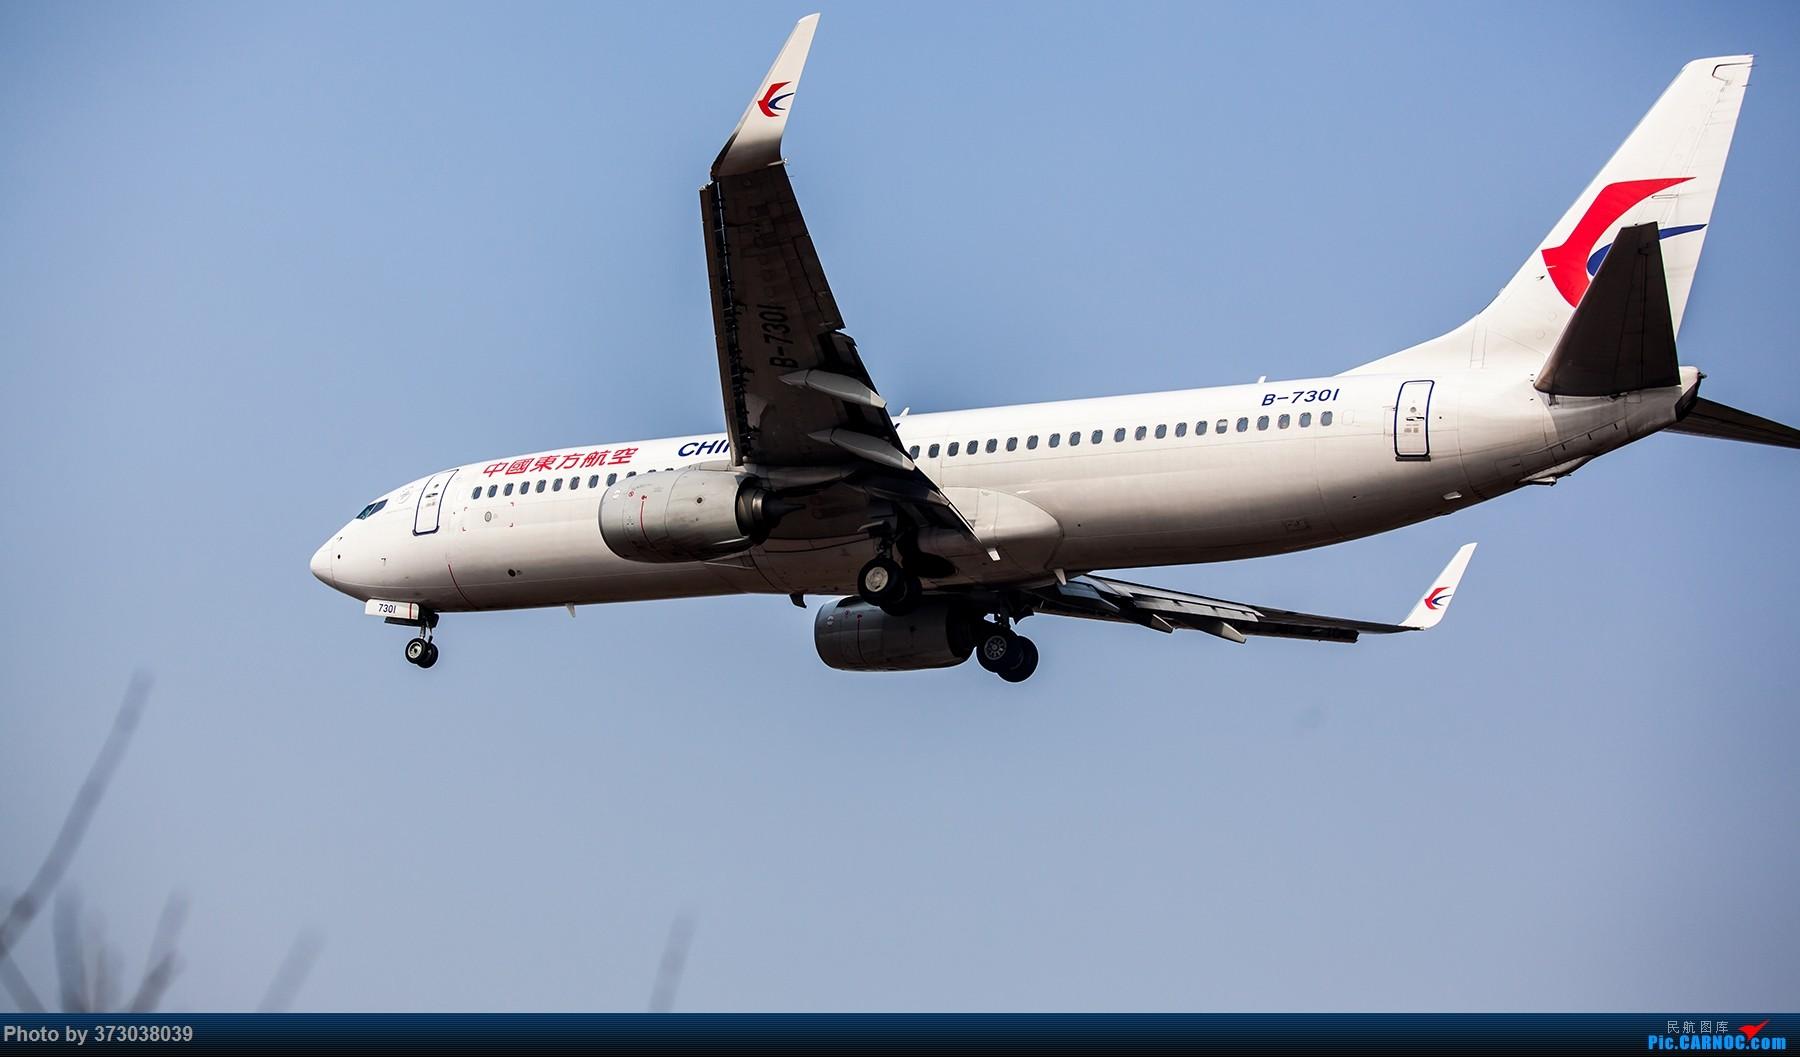 Re:[原创]【杭州飞友会】A320Neo迪士尼杭州萧山机场拍机班门弄斧记 BOEING 737-800 B-7301 中国杭州萧山国际机场